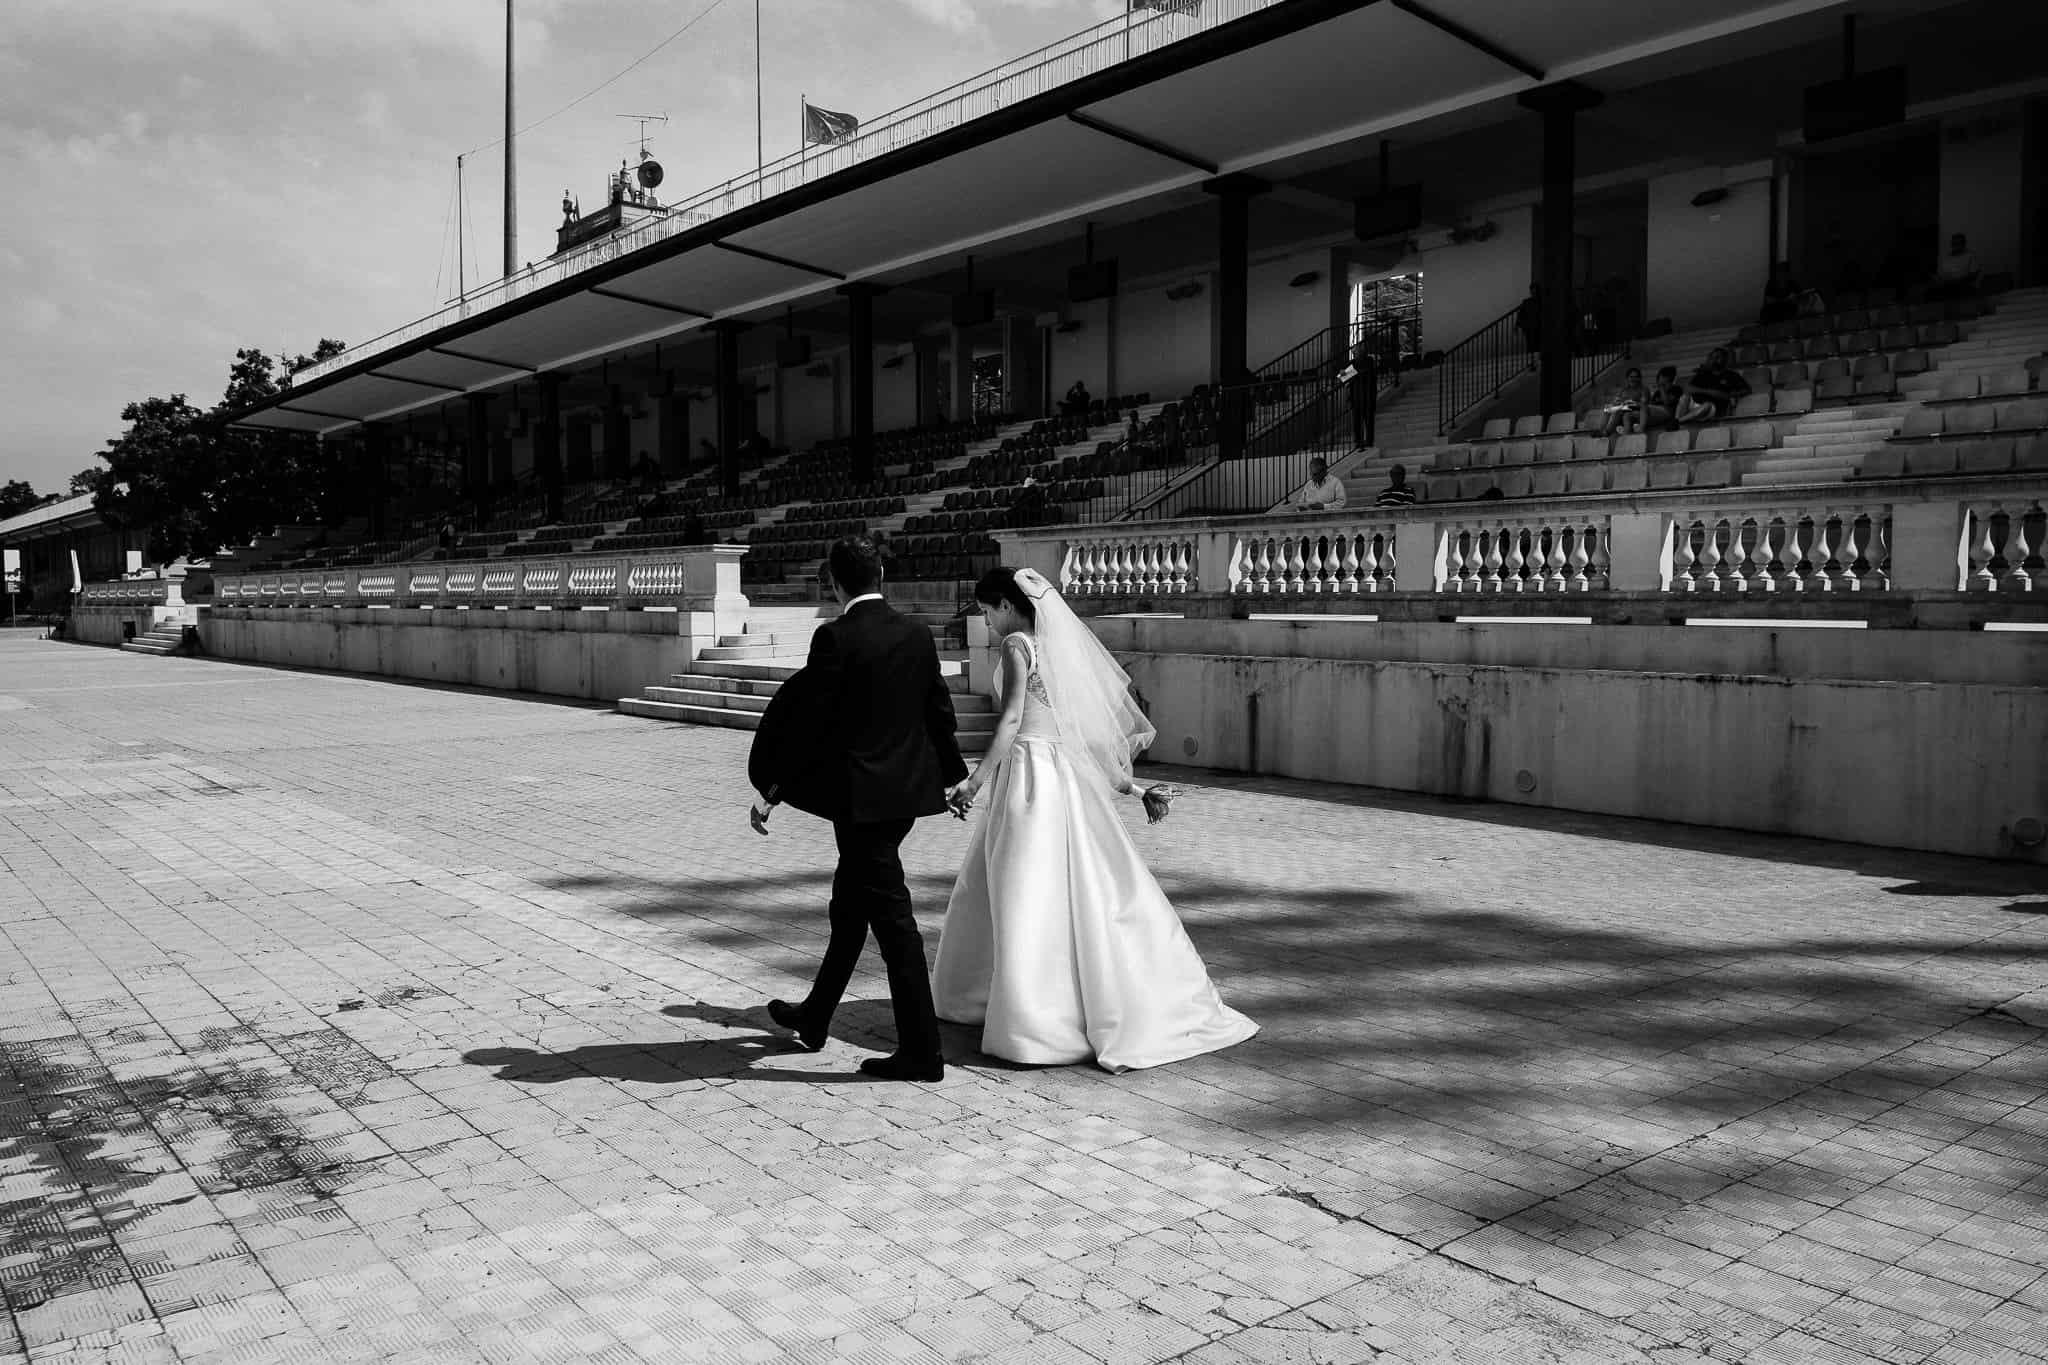 matrimonio Canter Milano San siro Luca rossi wedding reportage 0039